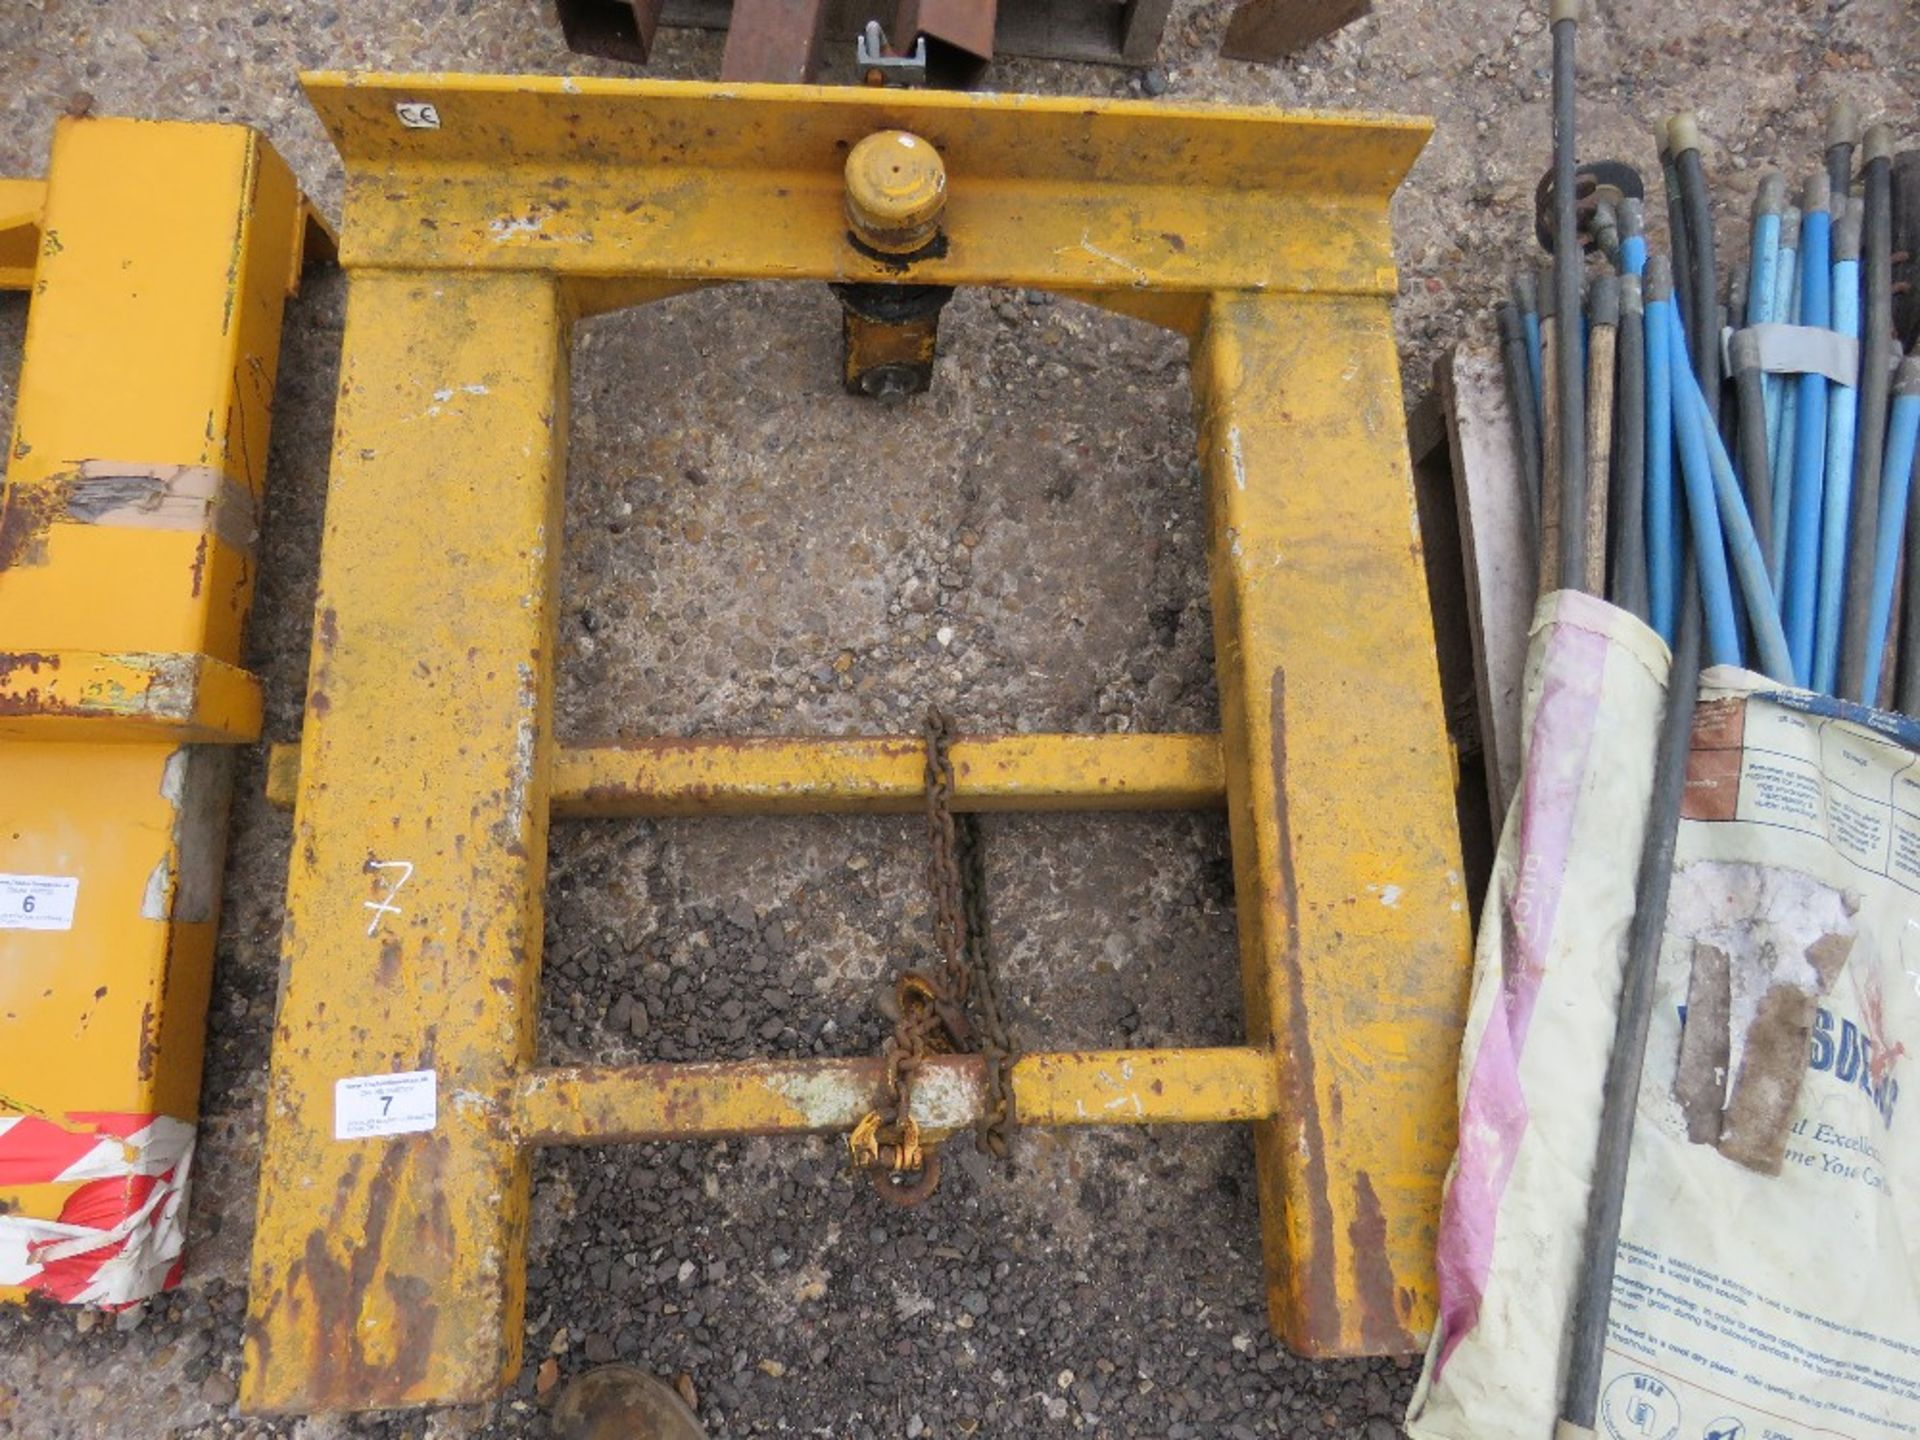 Lot 7 - FORKLIFT MOUNTED FRAME TO TAKE HOOK OR CANTILVER BLOCK GRAB